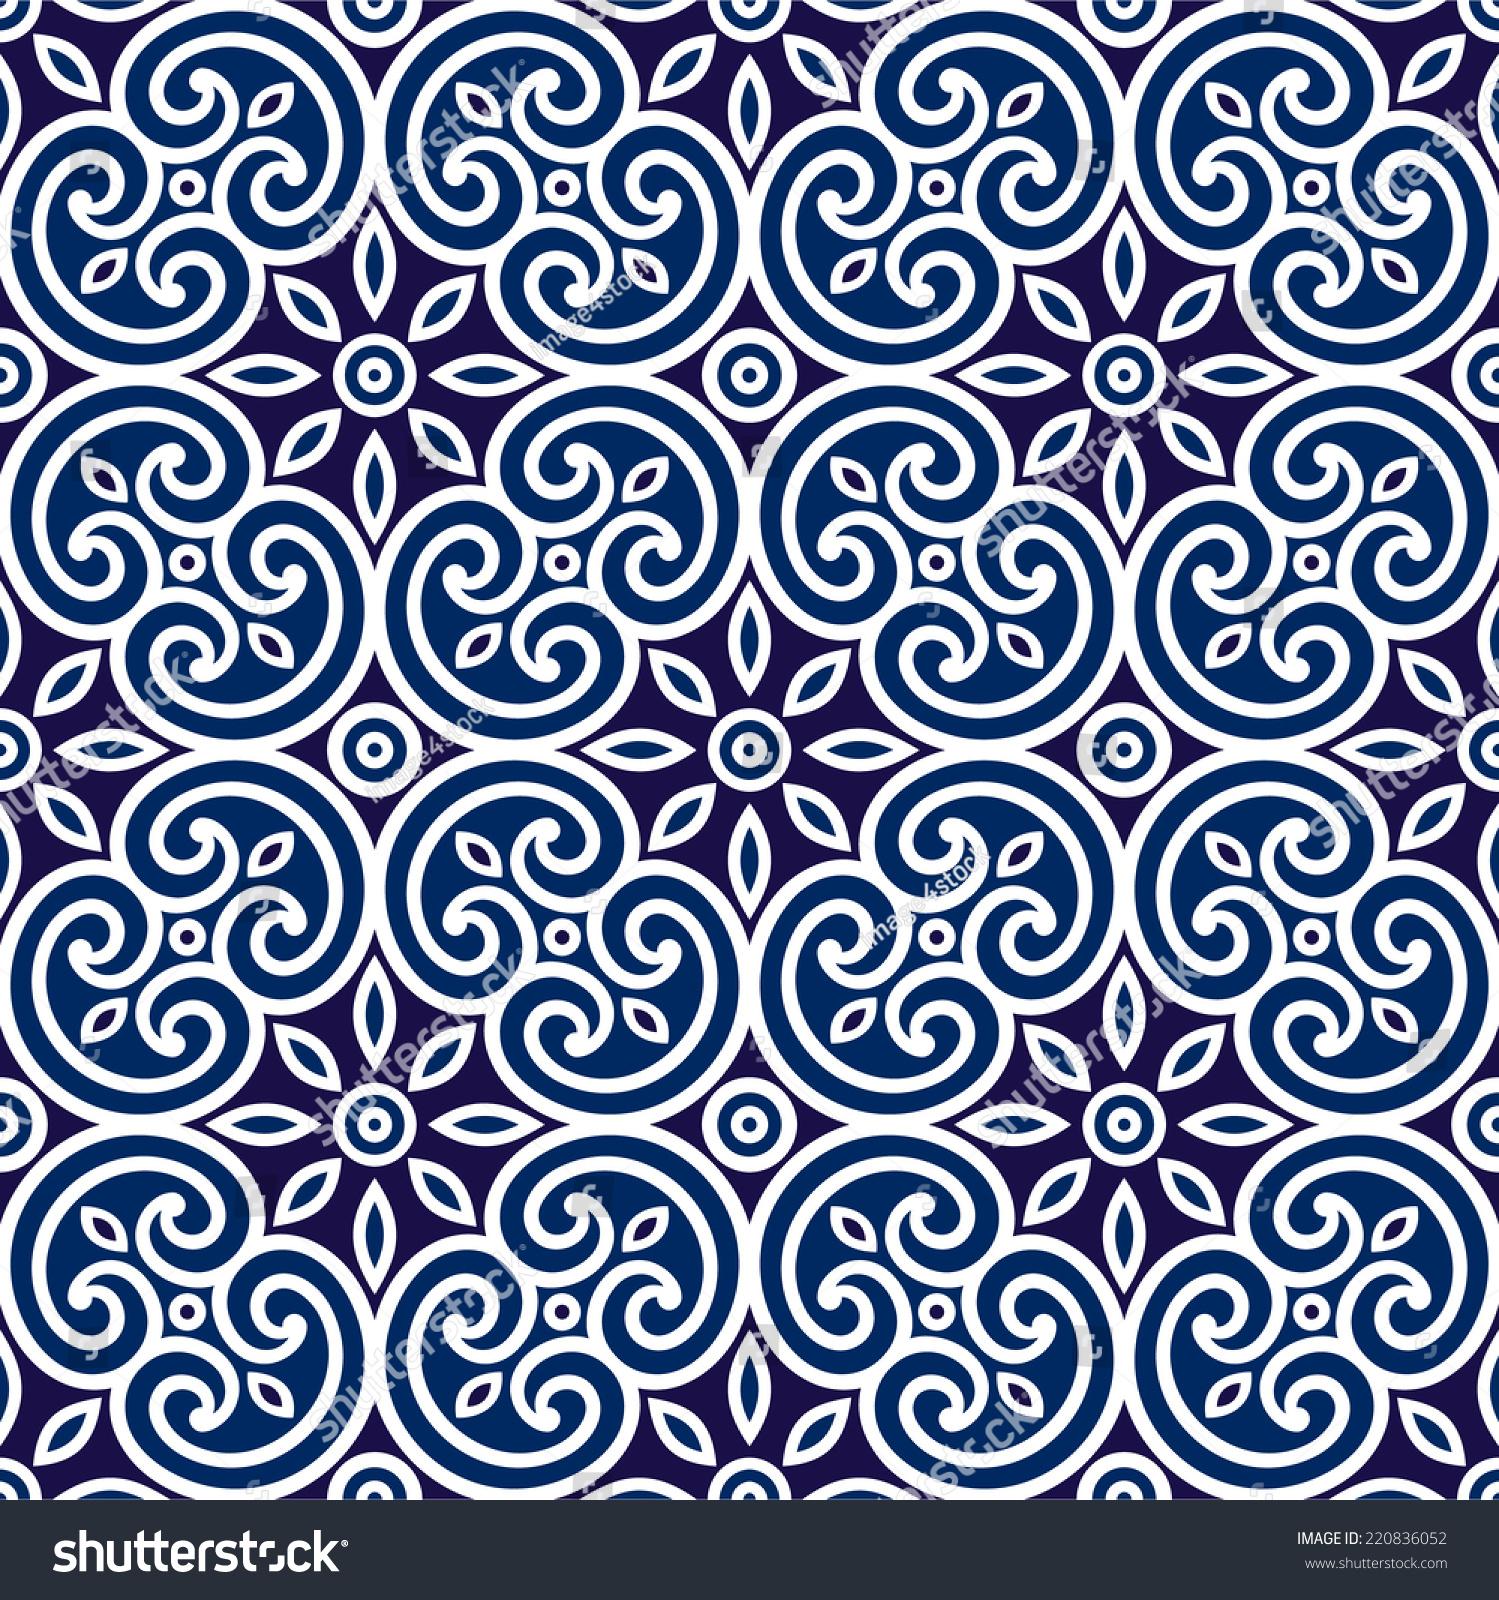 Decorative Geometric Seamless Ornament Tile Fabric Stock